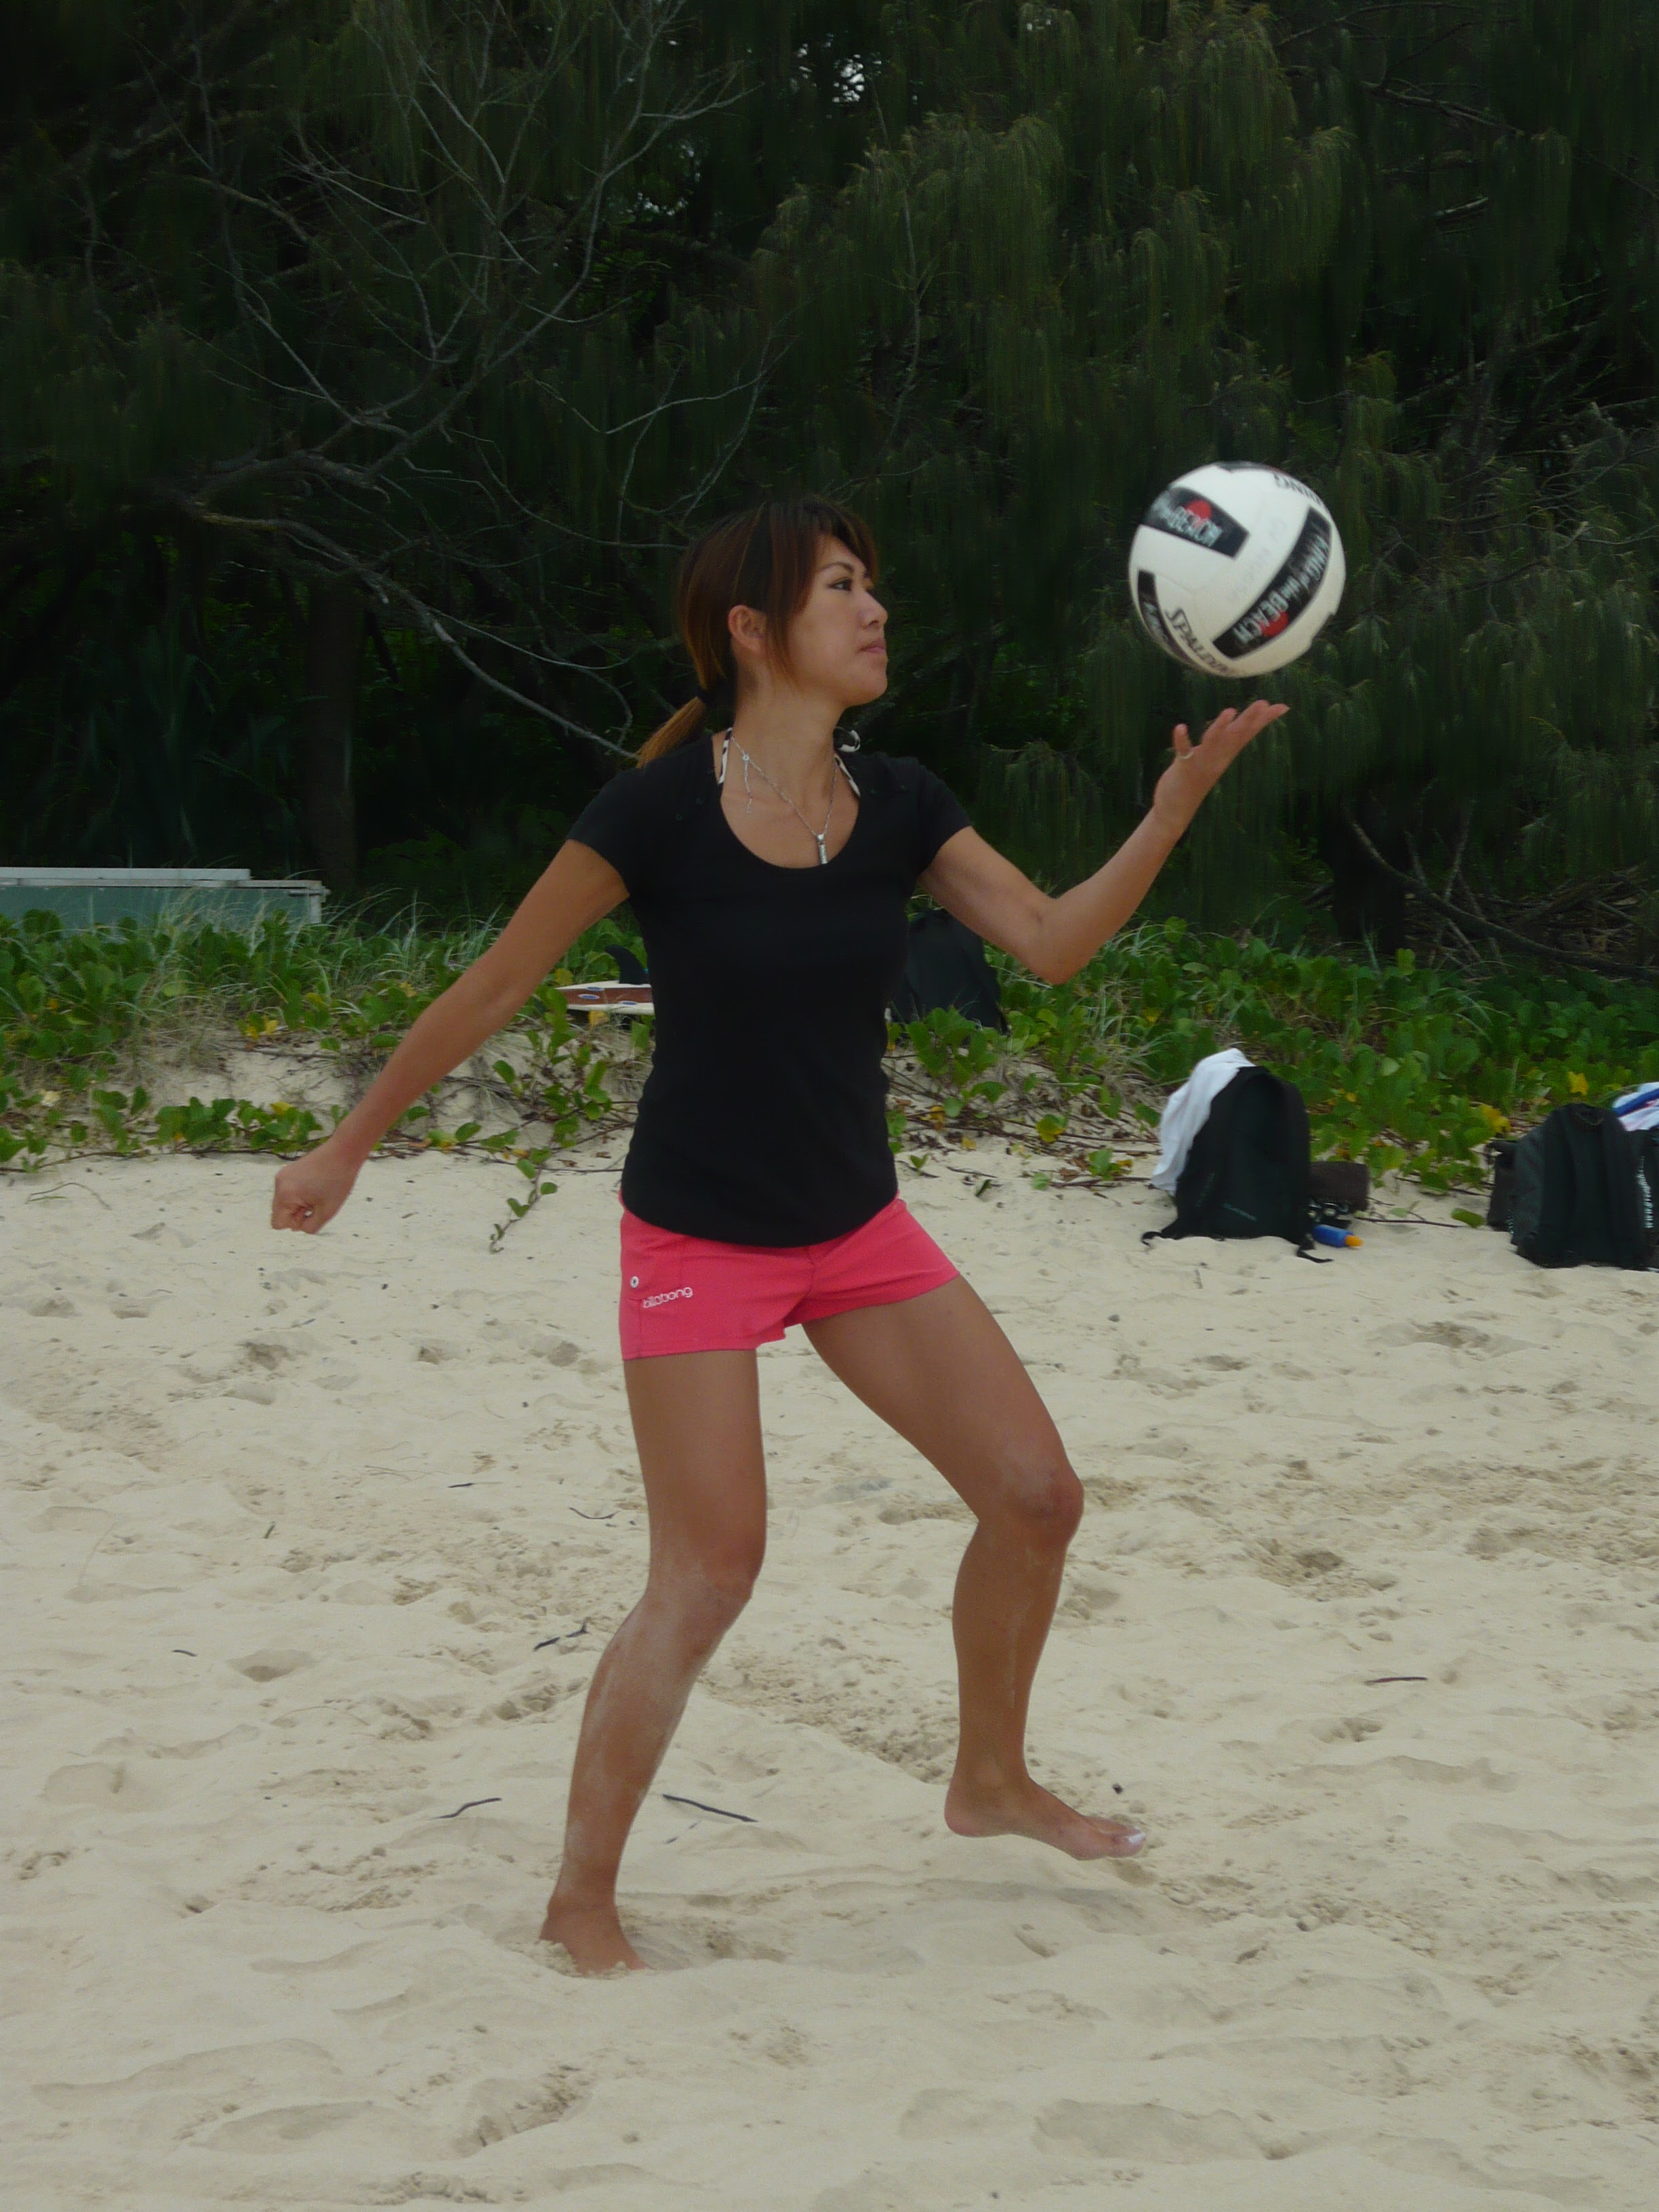 http://globalvillagenoosa.files.wordpress.com/2011/04/beach-volley-ball-ge-015.jpg